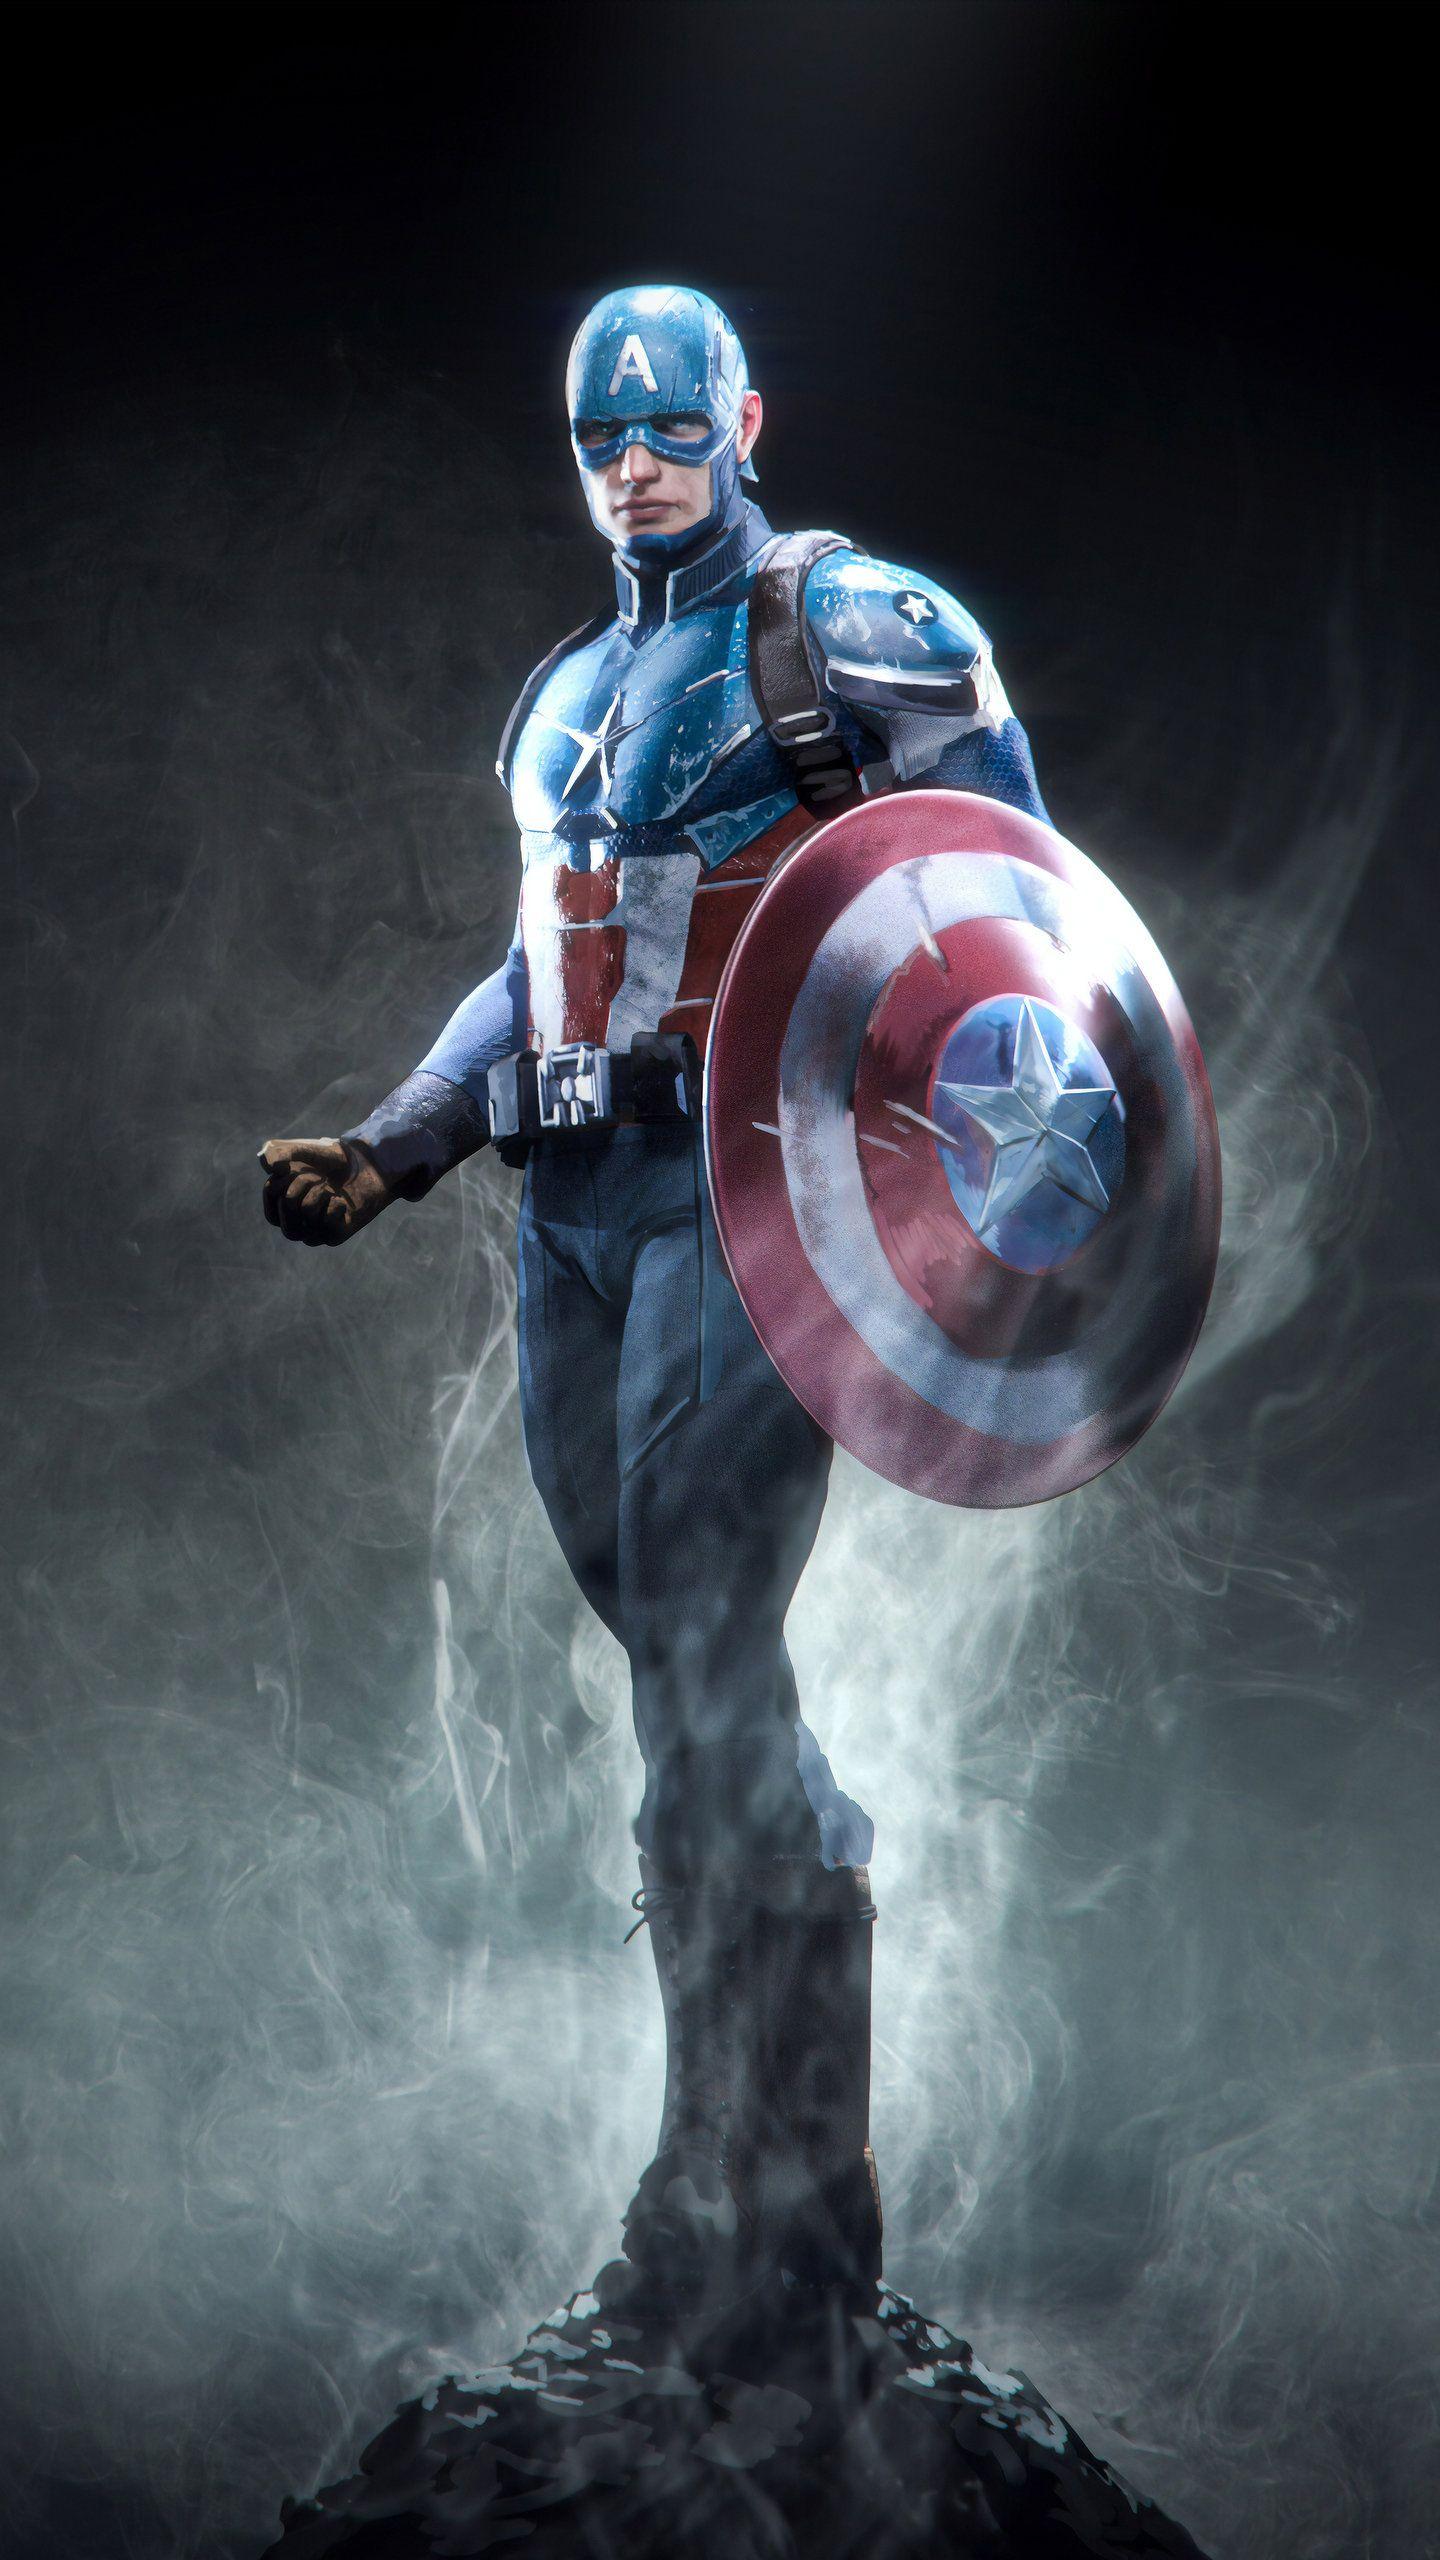 Captain America Marvel Superhero Hd Superheroes Wallpapers Photos